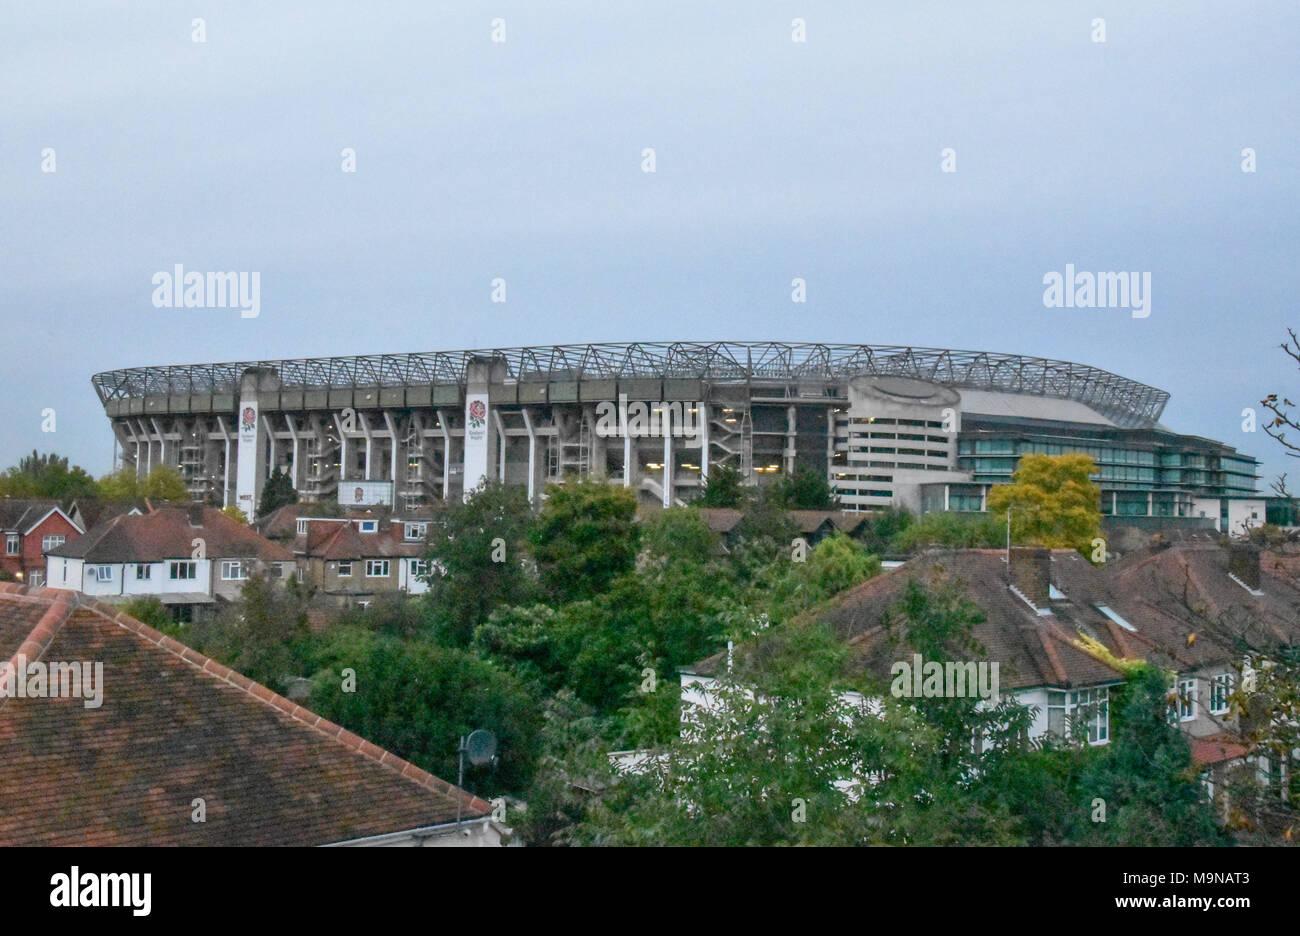 Twickenham Stadium, Whitton Road, Twickenham, London, England. The stadium is home to the England national rugby union team. - Stock Image